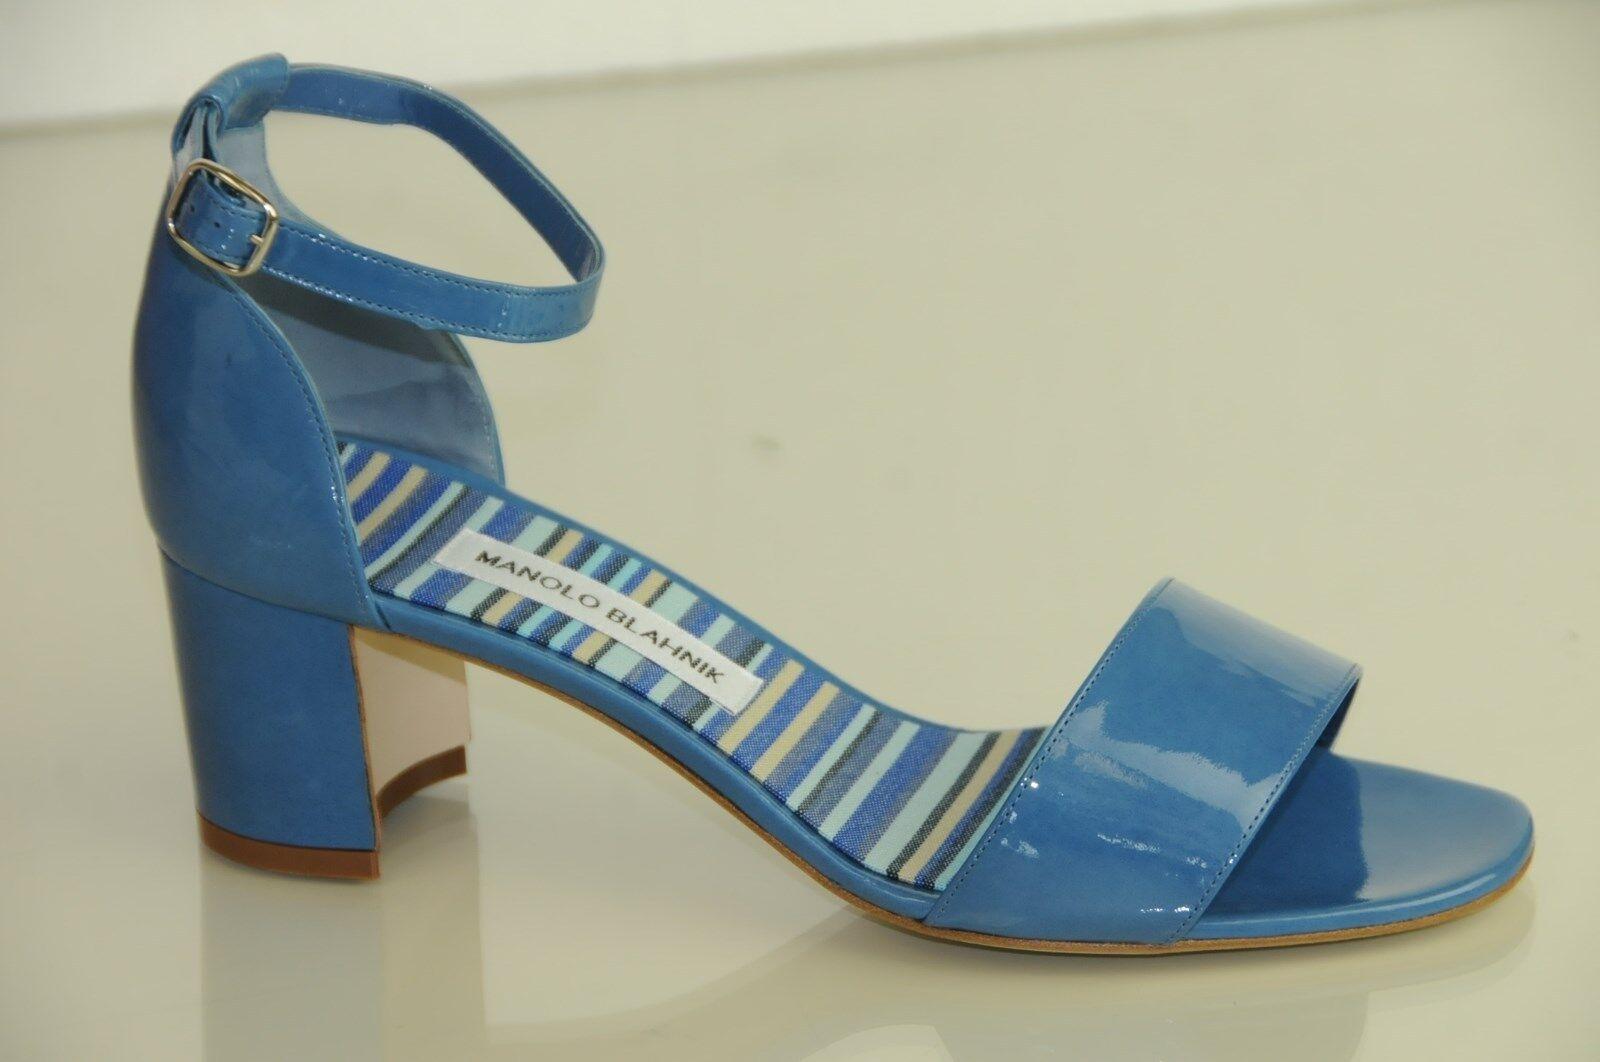 bellissimo New Manolo Manolo Manolo Blahnik Lauratomod Block Heel Ankle Strap Sandals scarpe 40.5  colorways incredibili